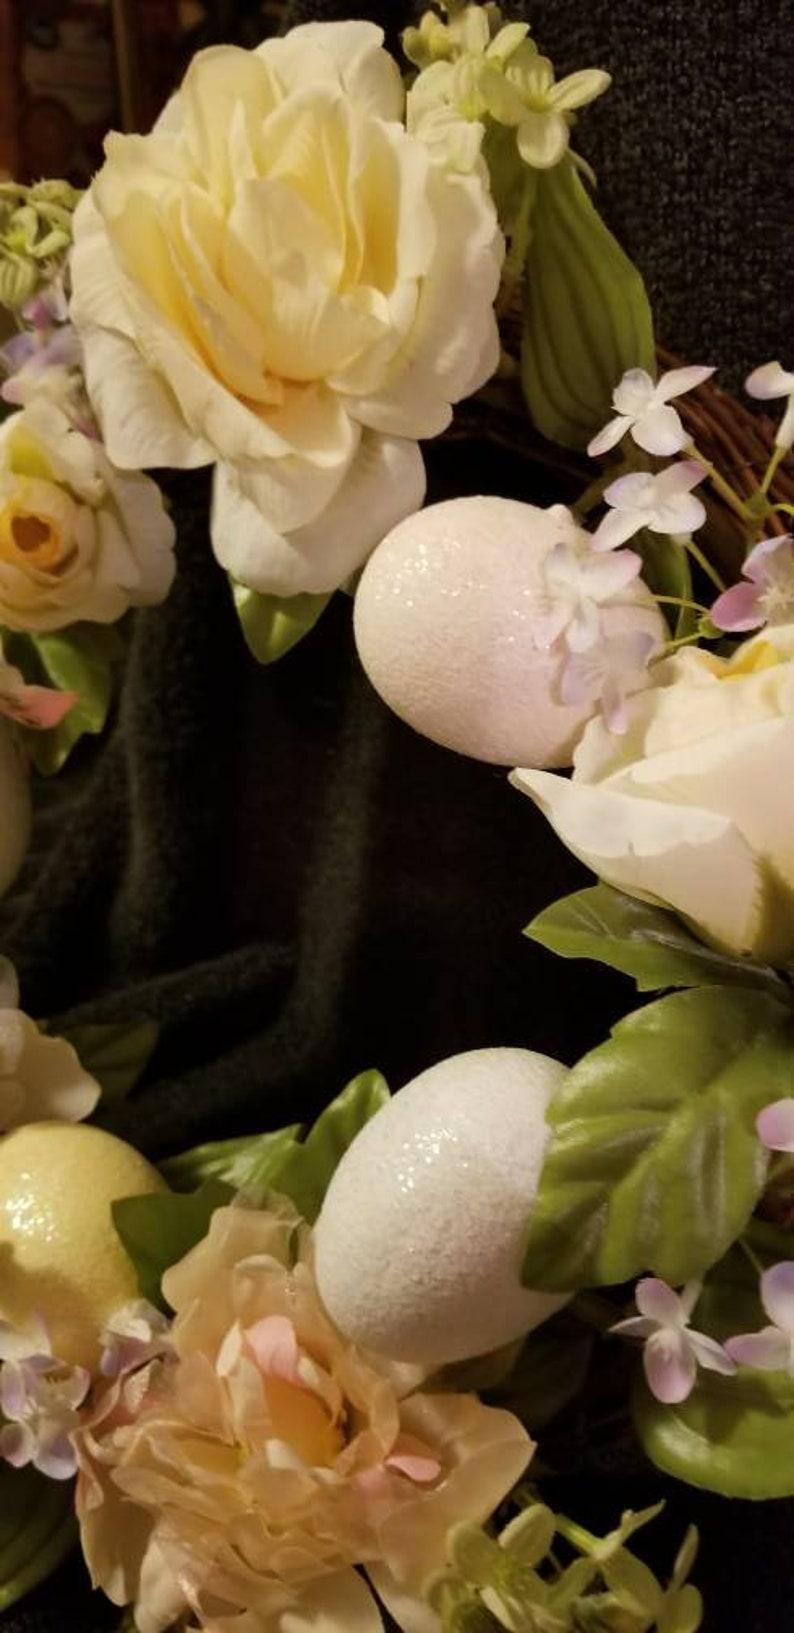 Avon Spring Wreath with box; Avon gift collection; Vintage Avon wreath; Spring wreath; Free Shipping